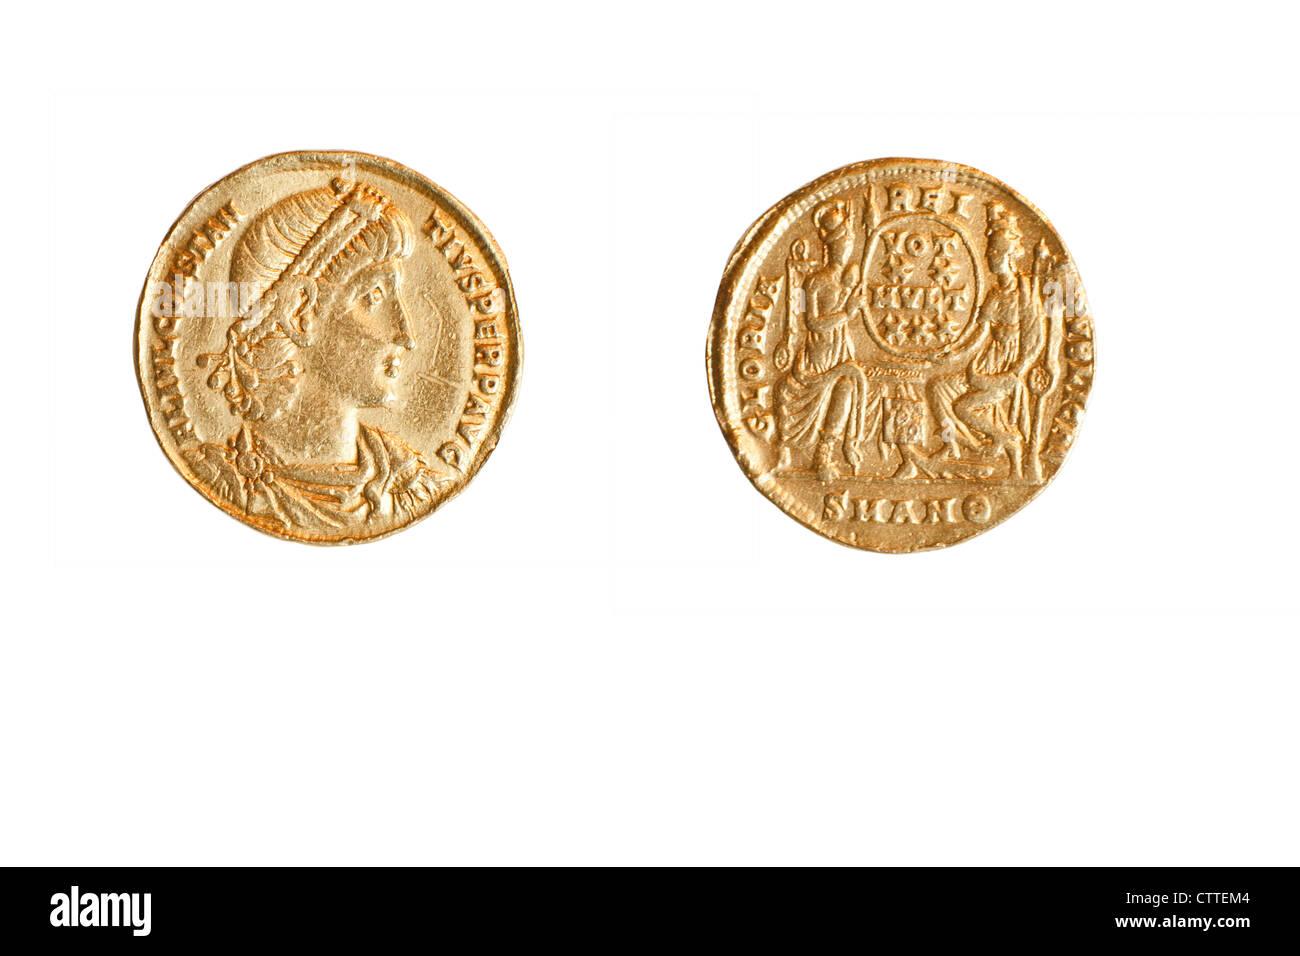 Golden Roman Coin. Emperor Constantine II (Constantinus) 337-361 CE Gold 4.5gr - Stock Image